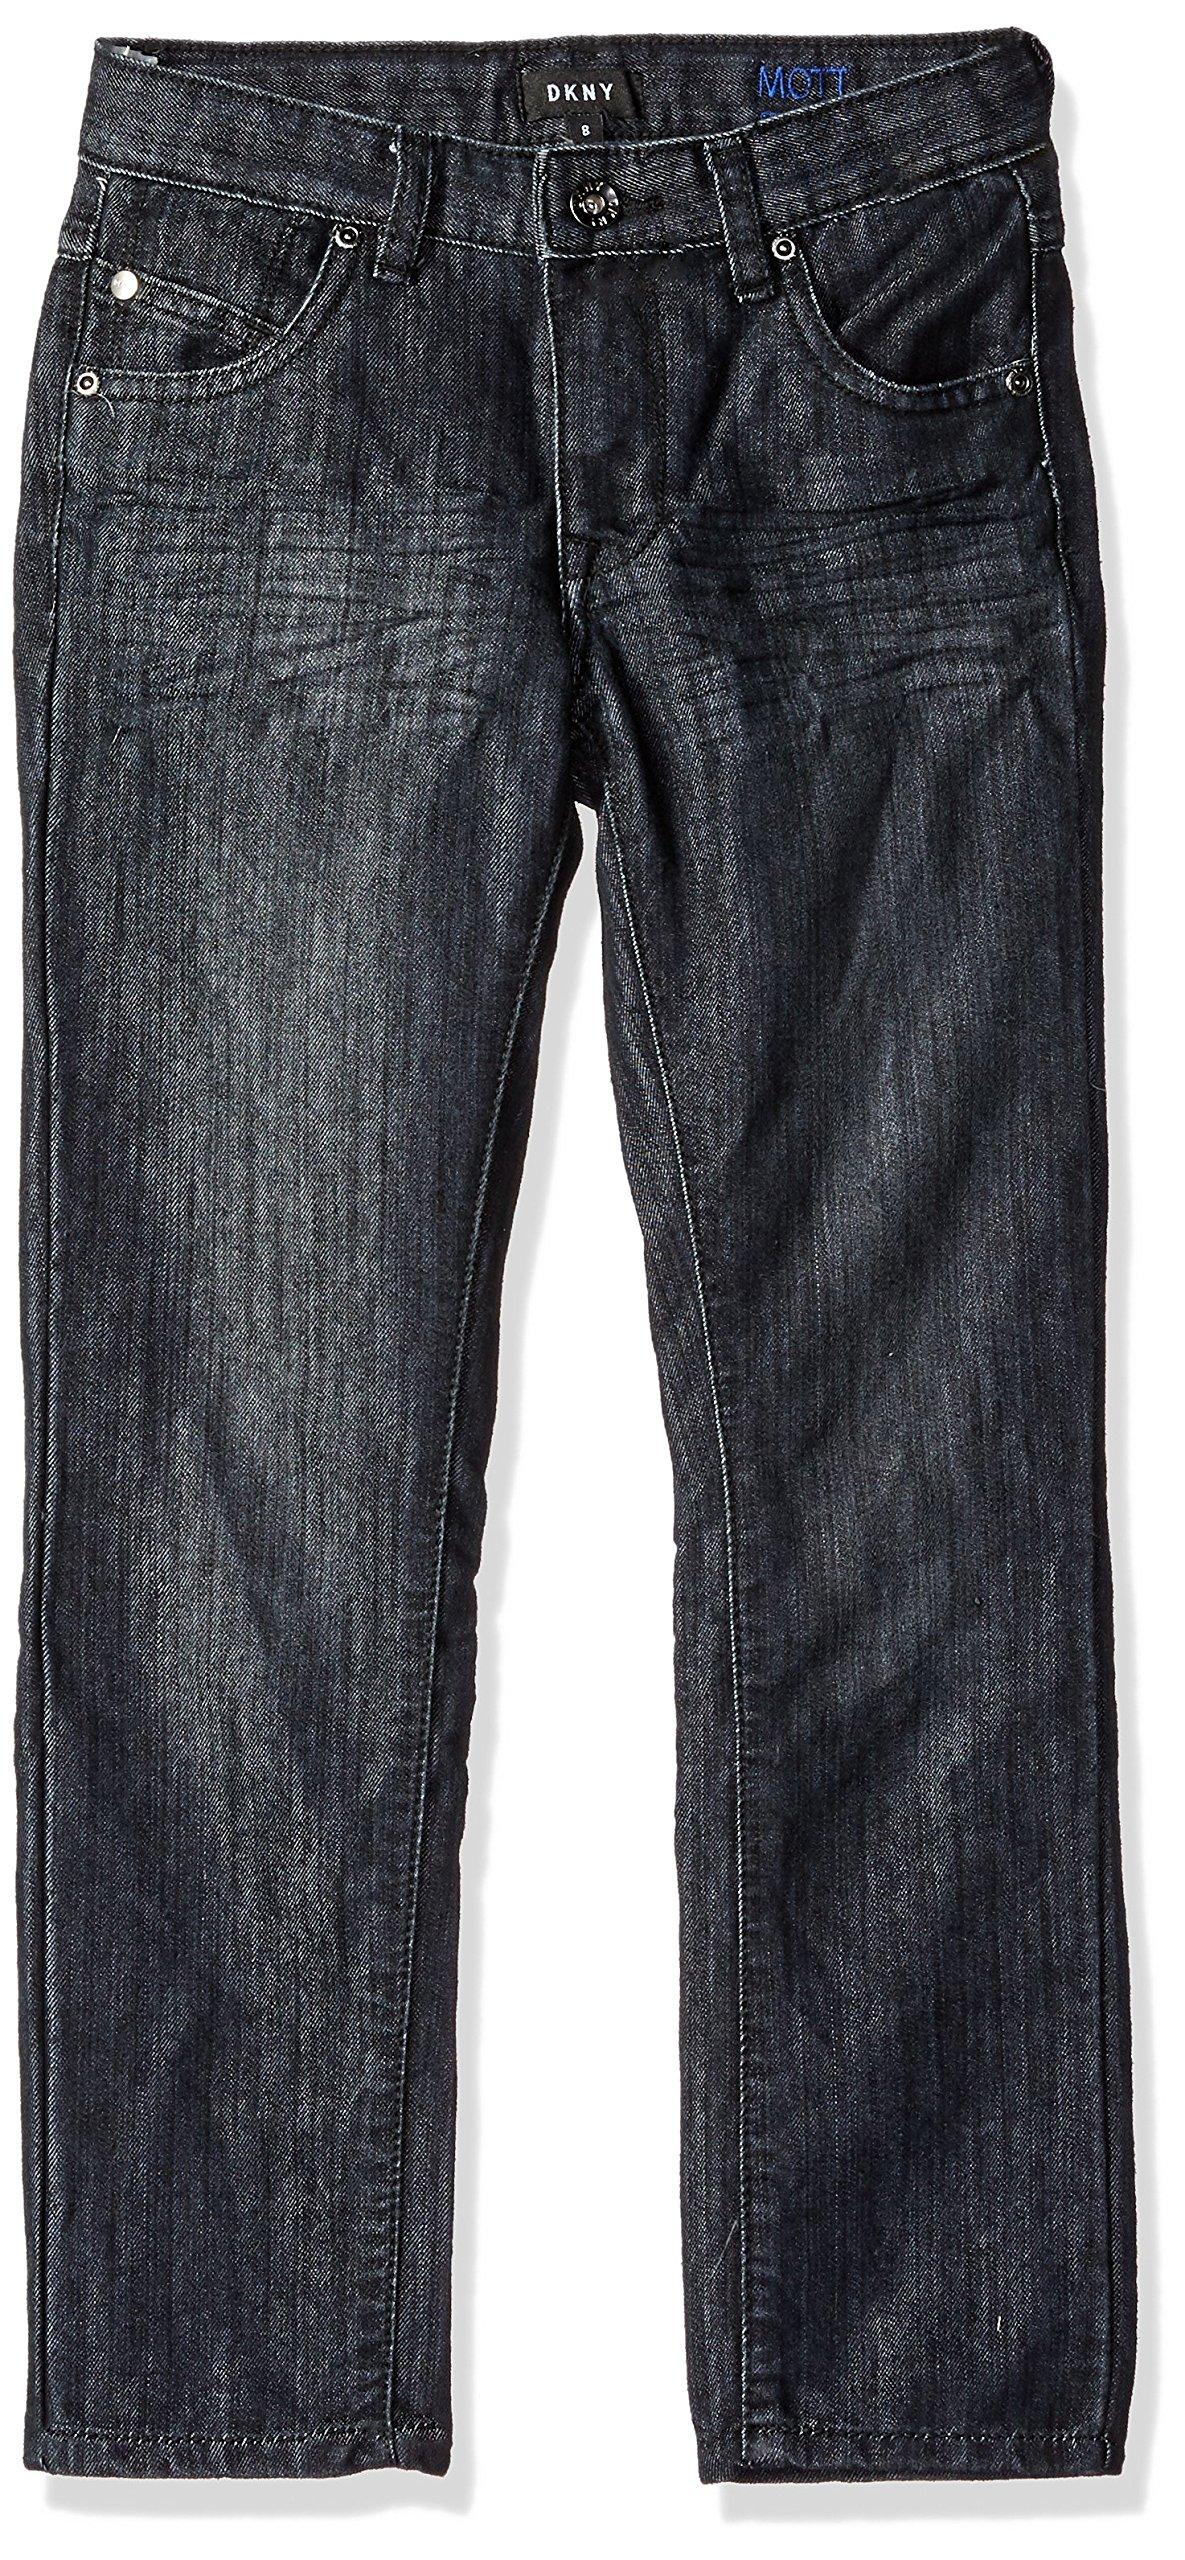 DKNY Big Boys' Mott Stretch Denim Straight Fit Jean, Wash Black, 16